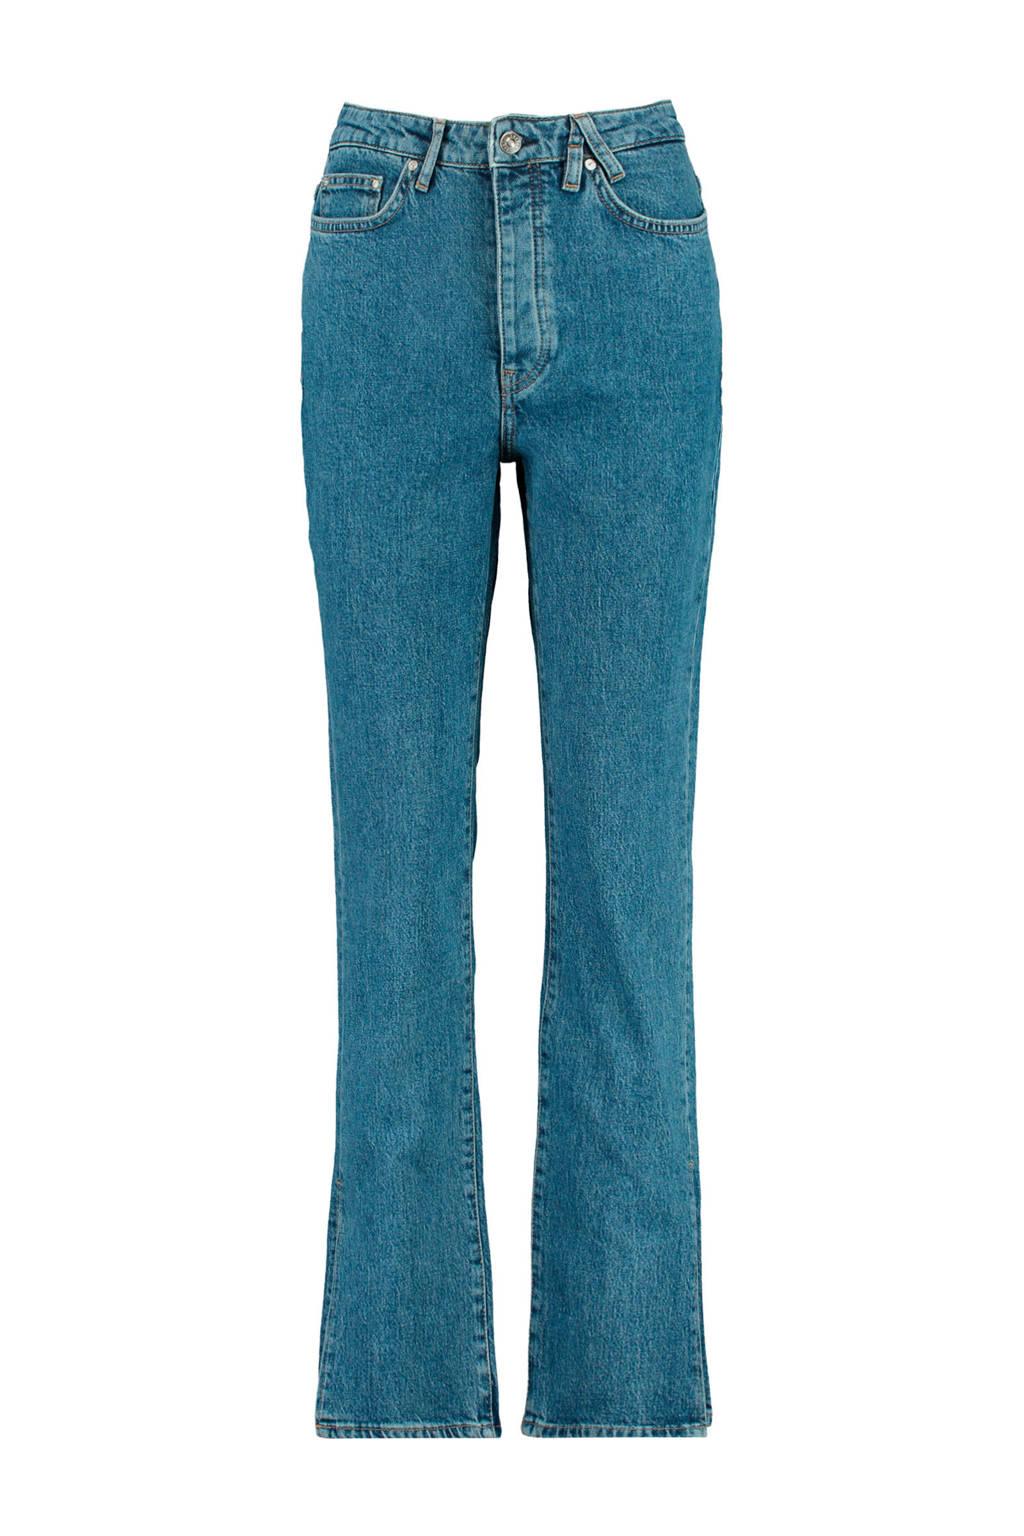 America Today high waist straight fit jeans Mila vintage blue, Vintage blue